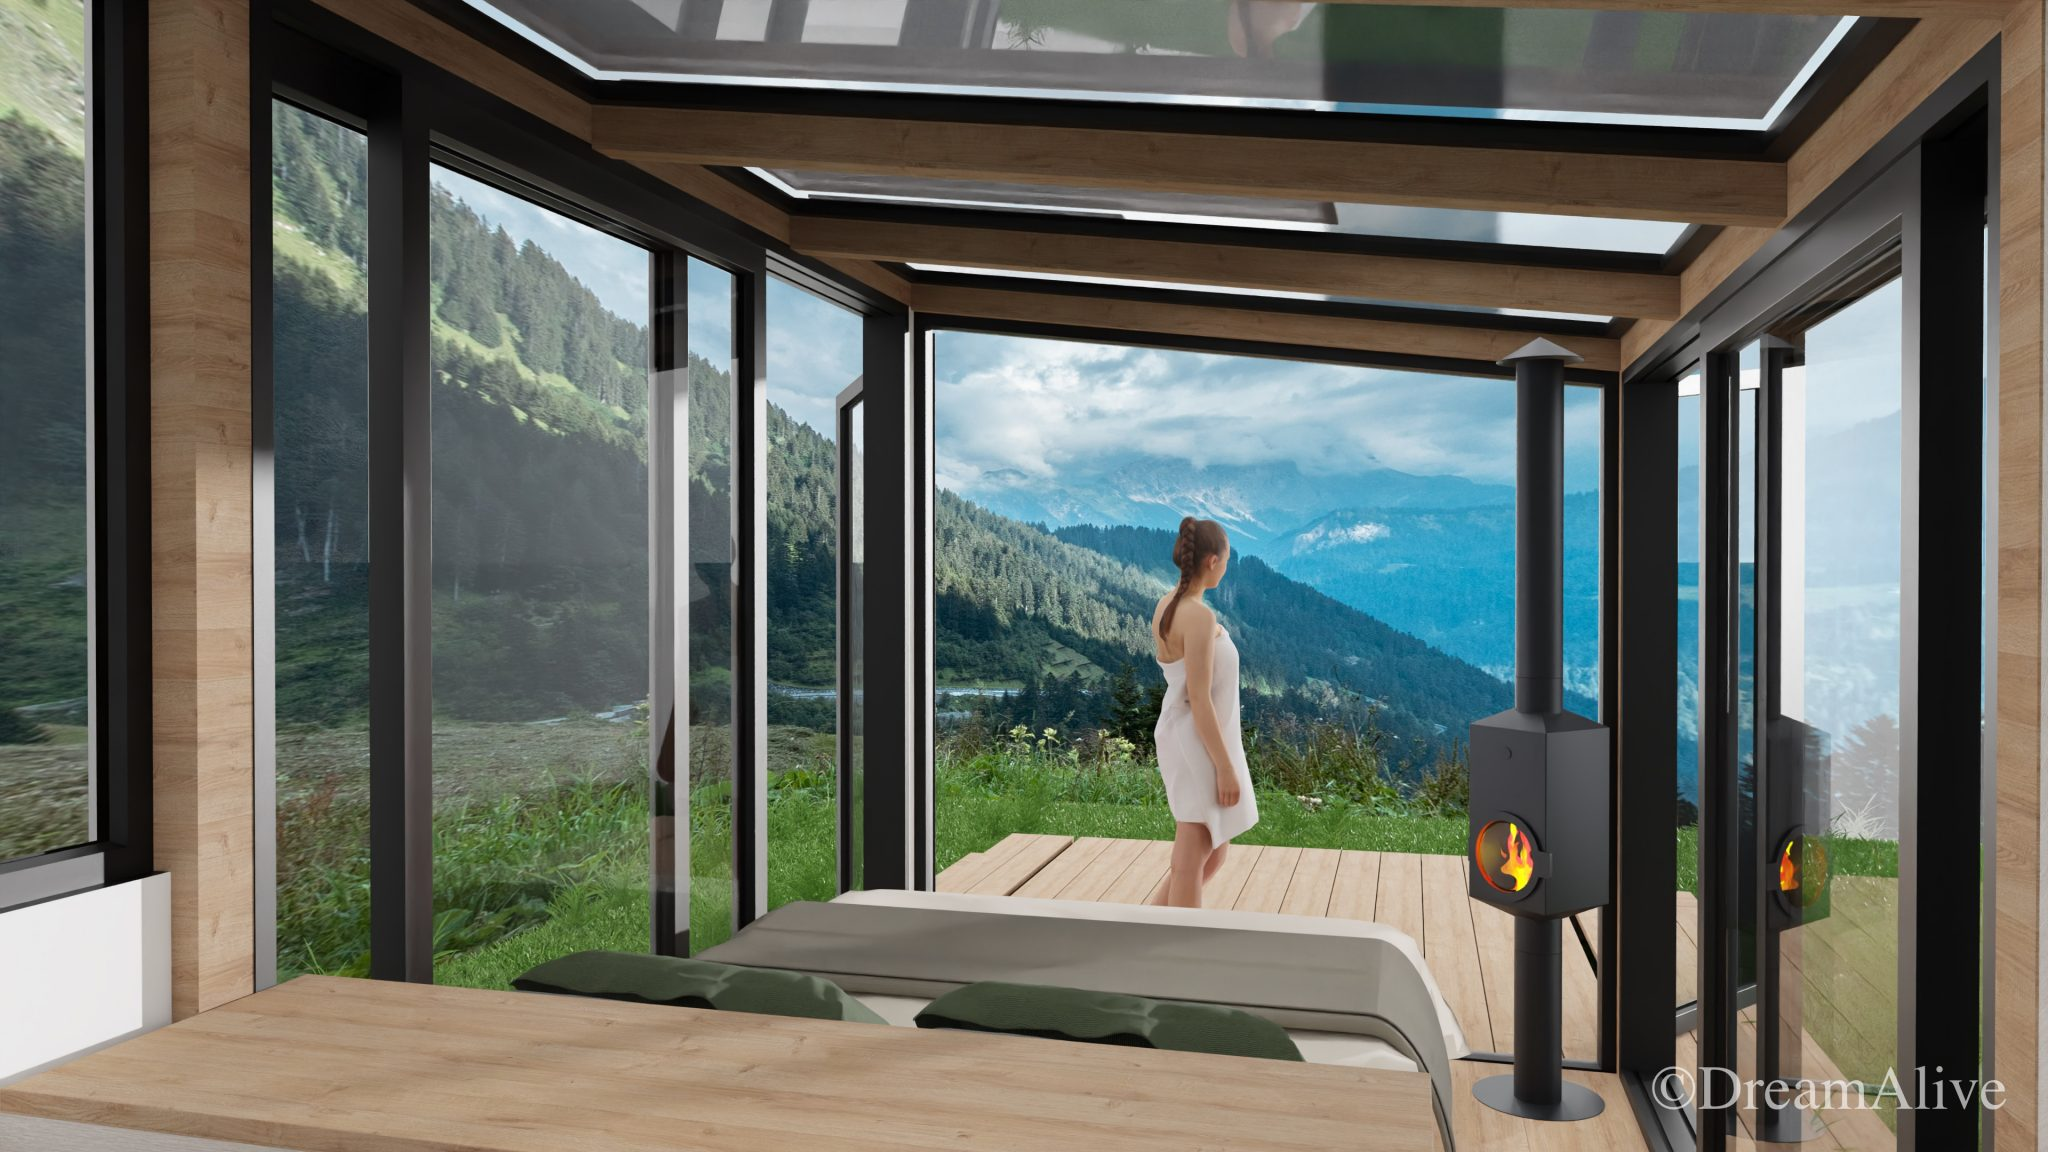 DreamAlive Interior Lodge Walsertal Equipment Prototype